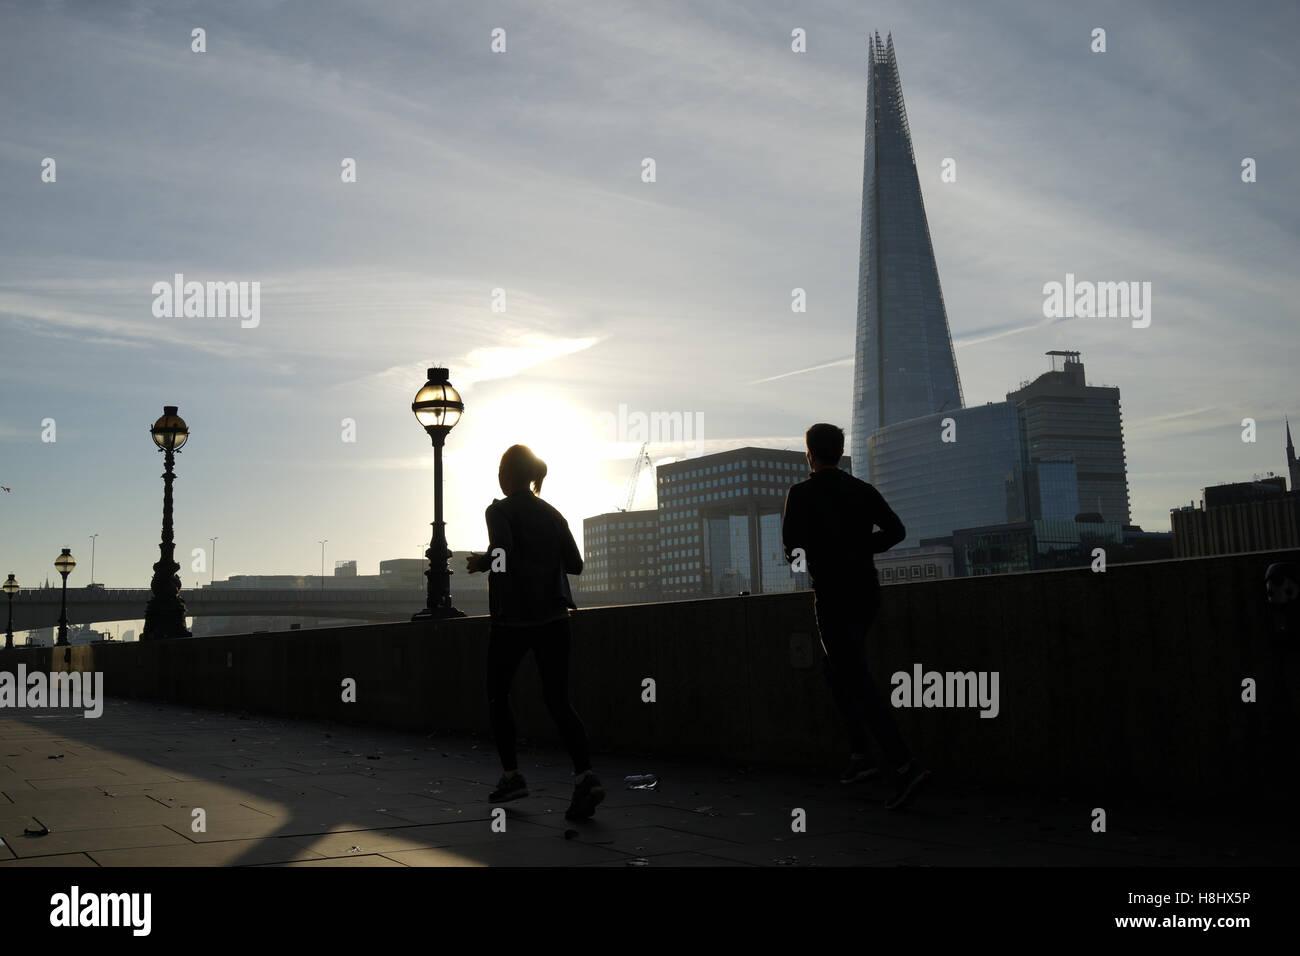 Ein paar, die entlang der Themse, London Stockfoto